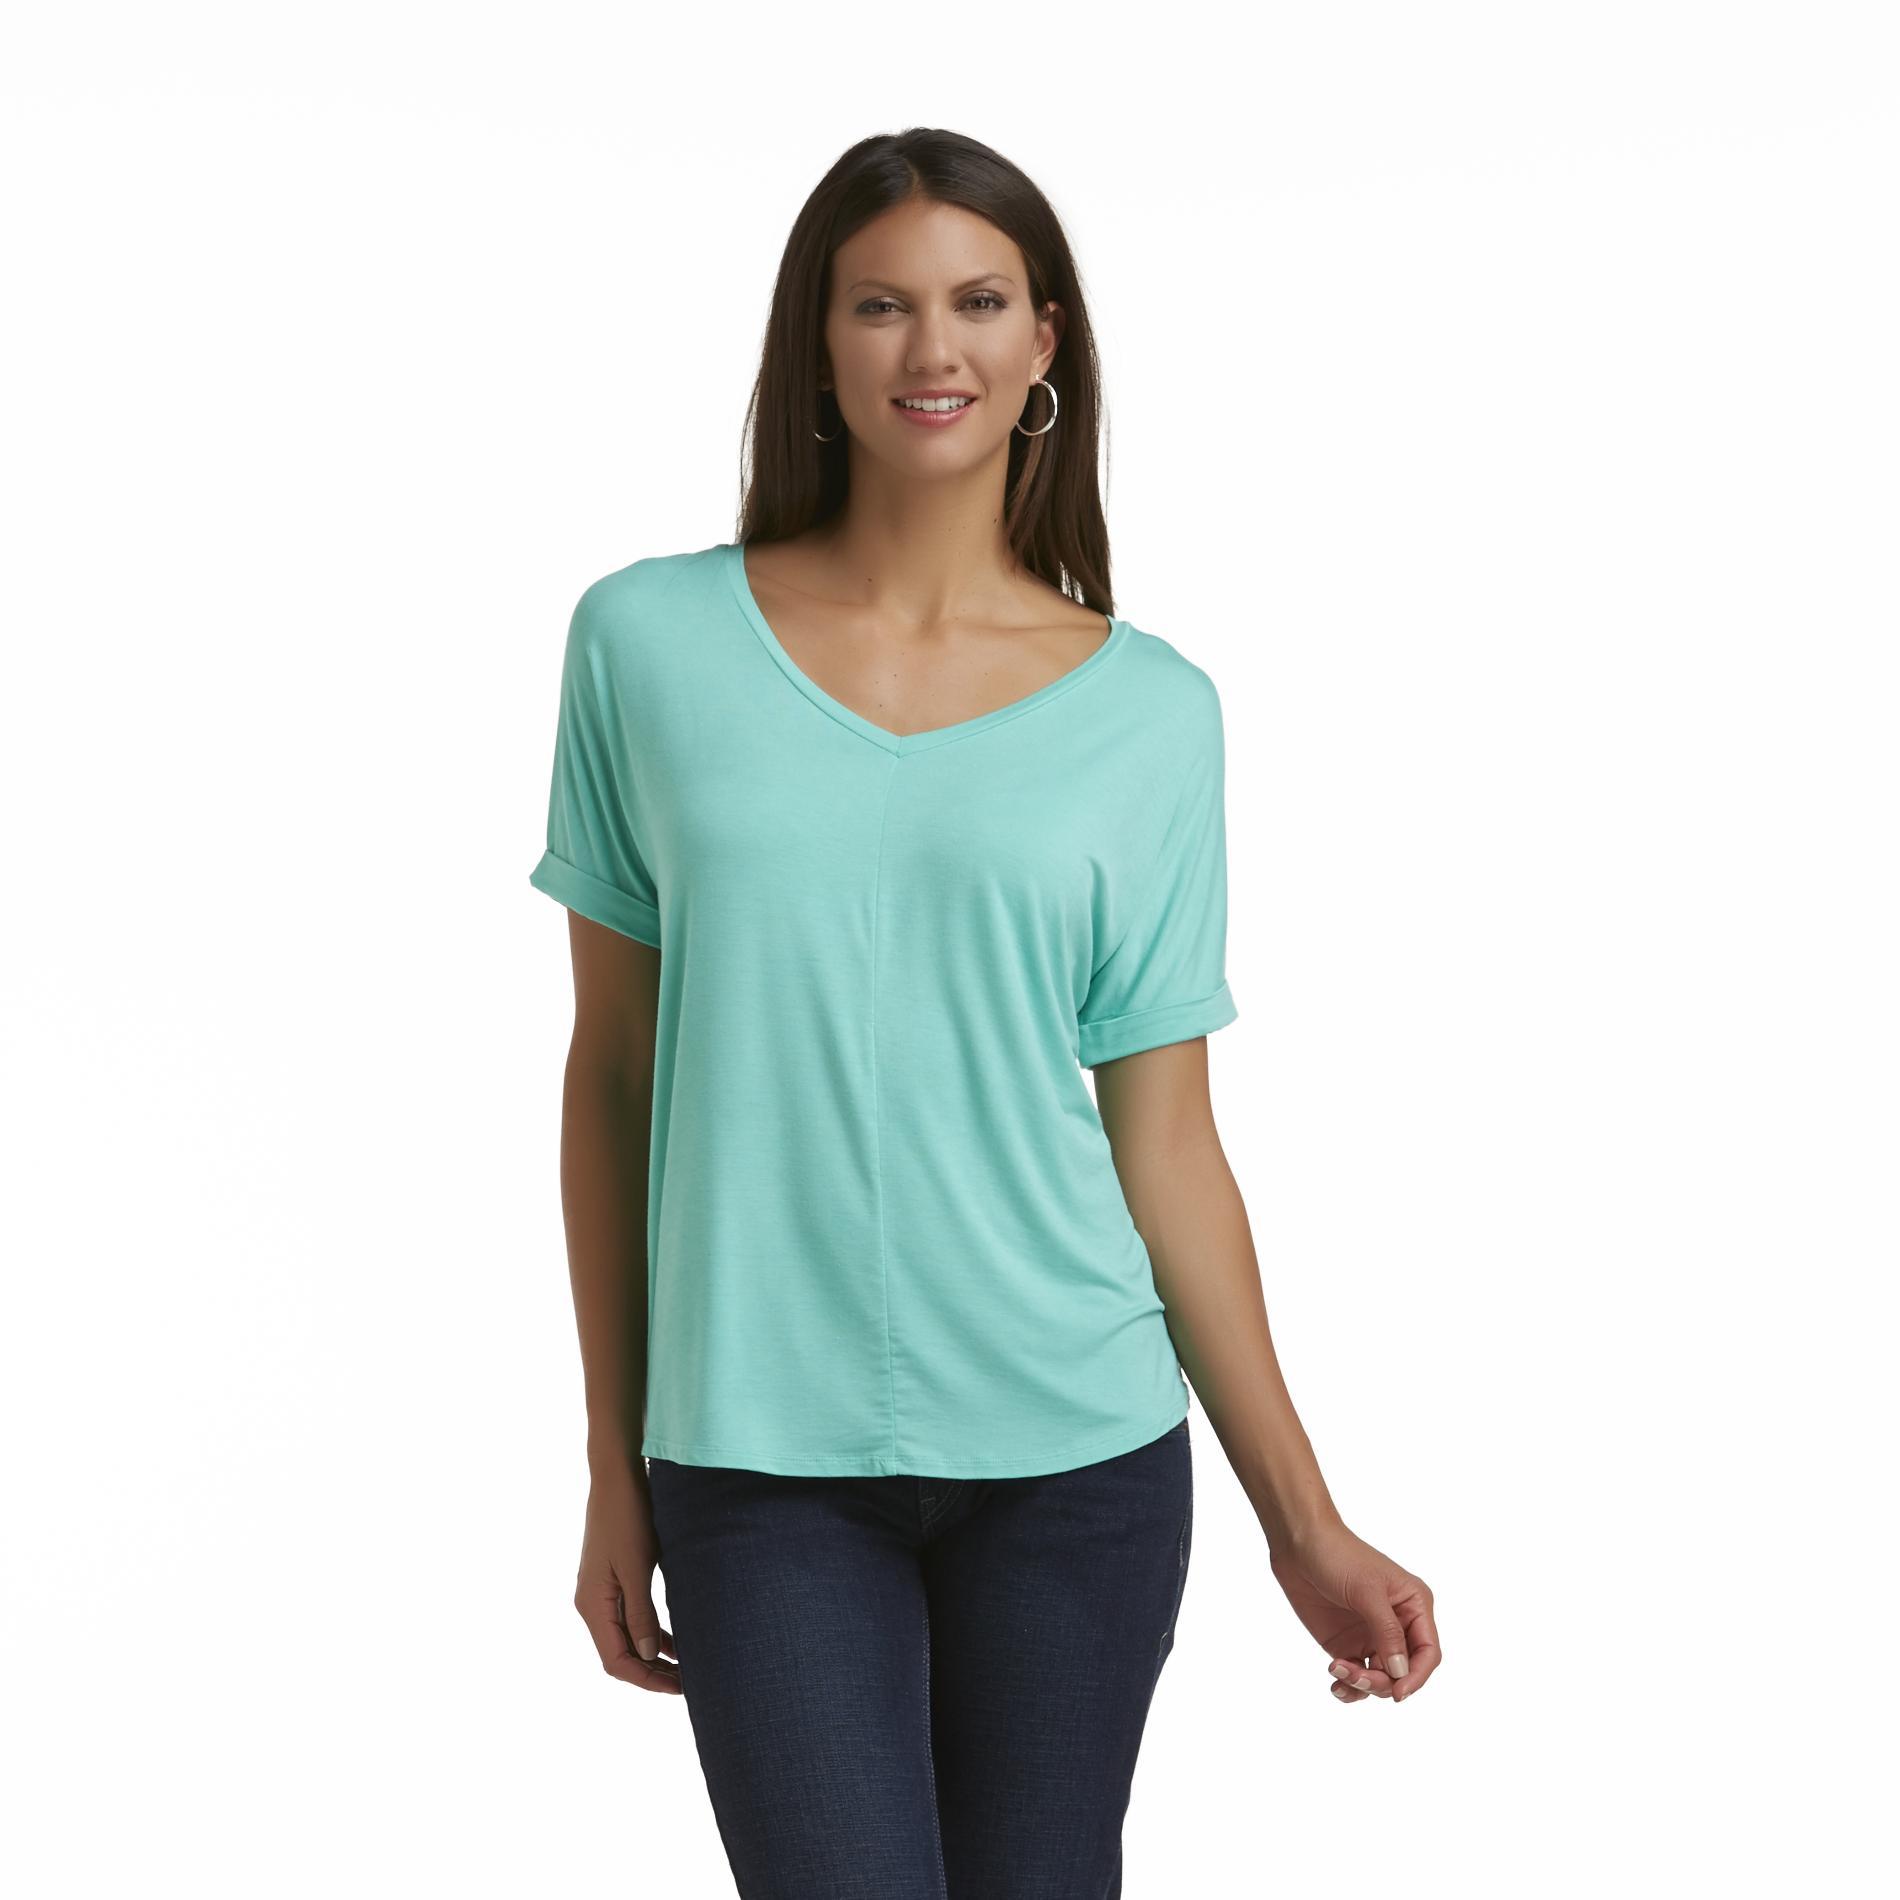 Metaphor Women's Short-Sleeve T-Shirt at Sears.com